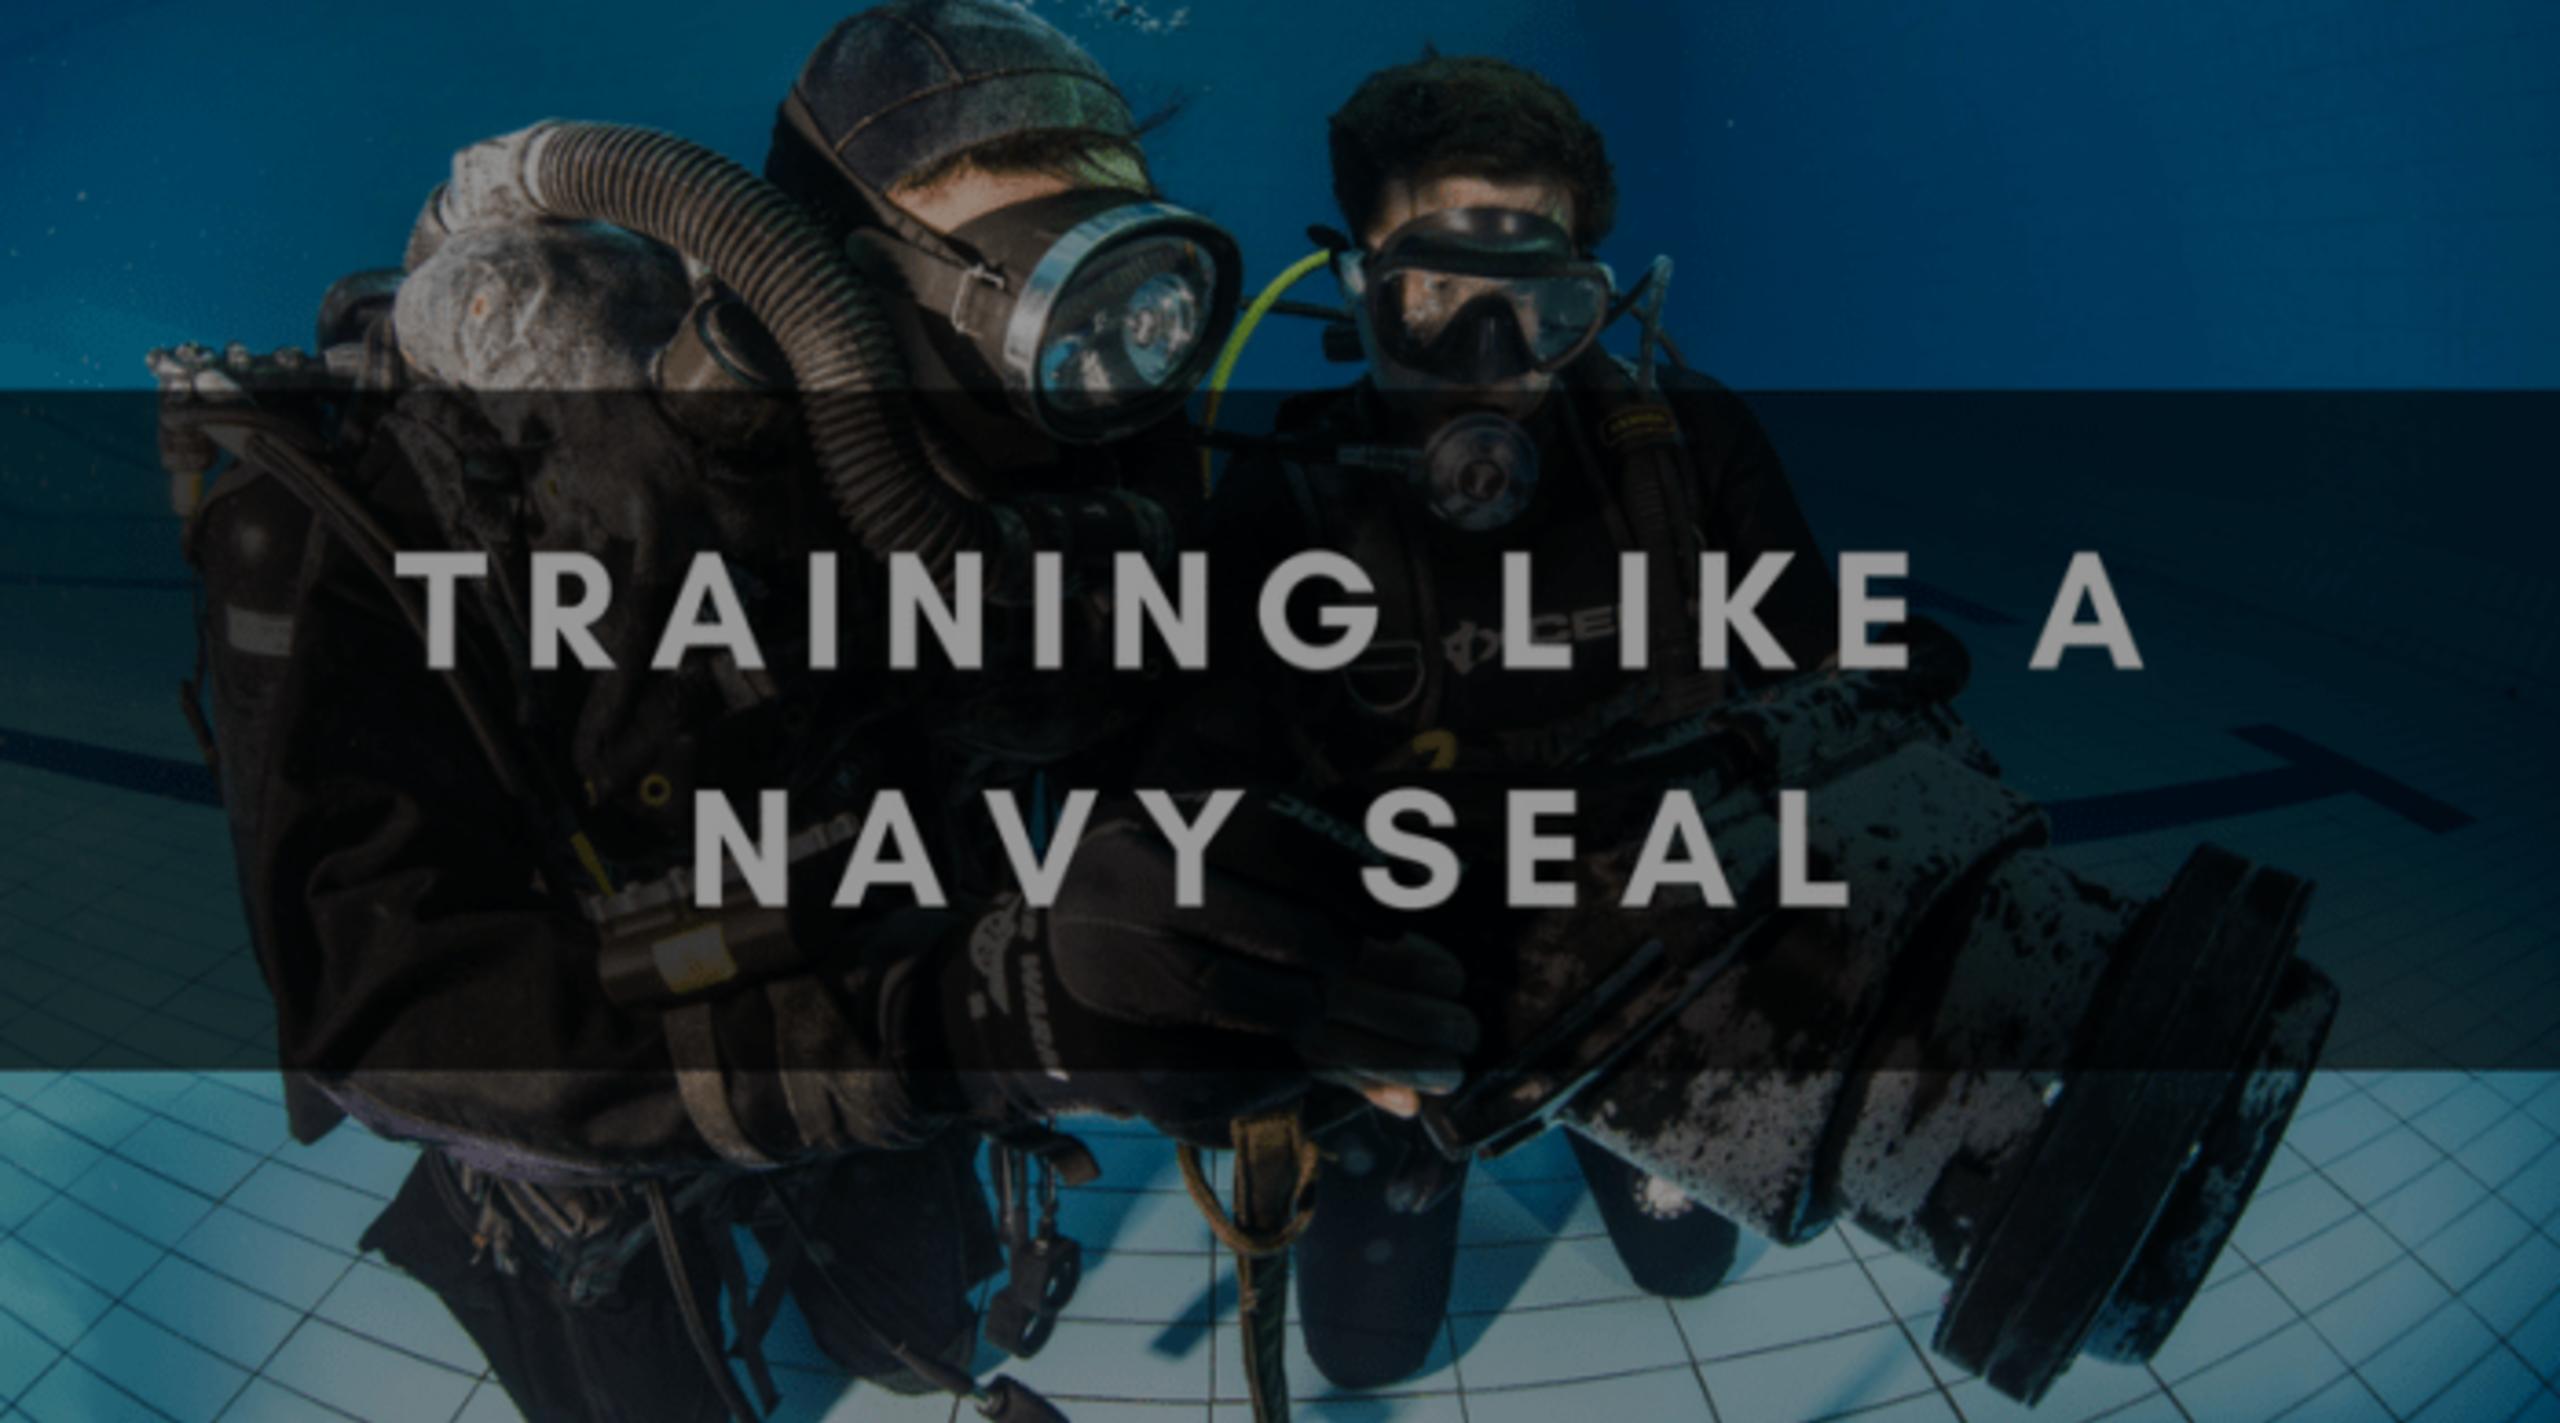 TRAINING LIKE A NAVY SEAL